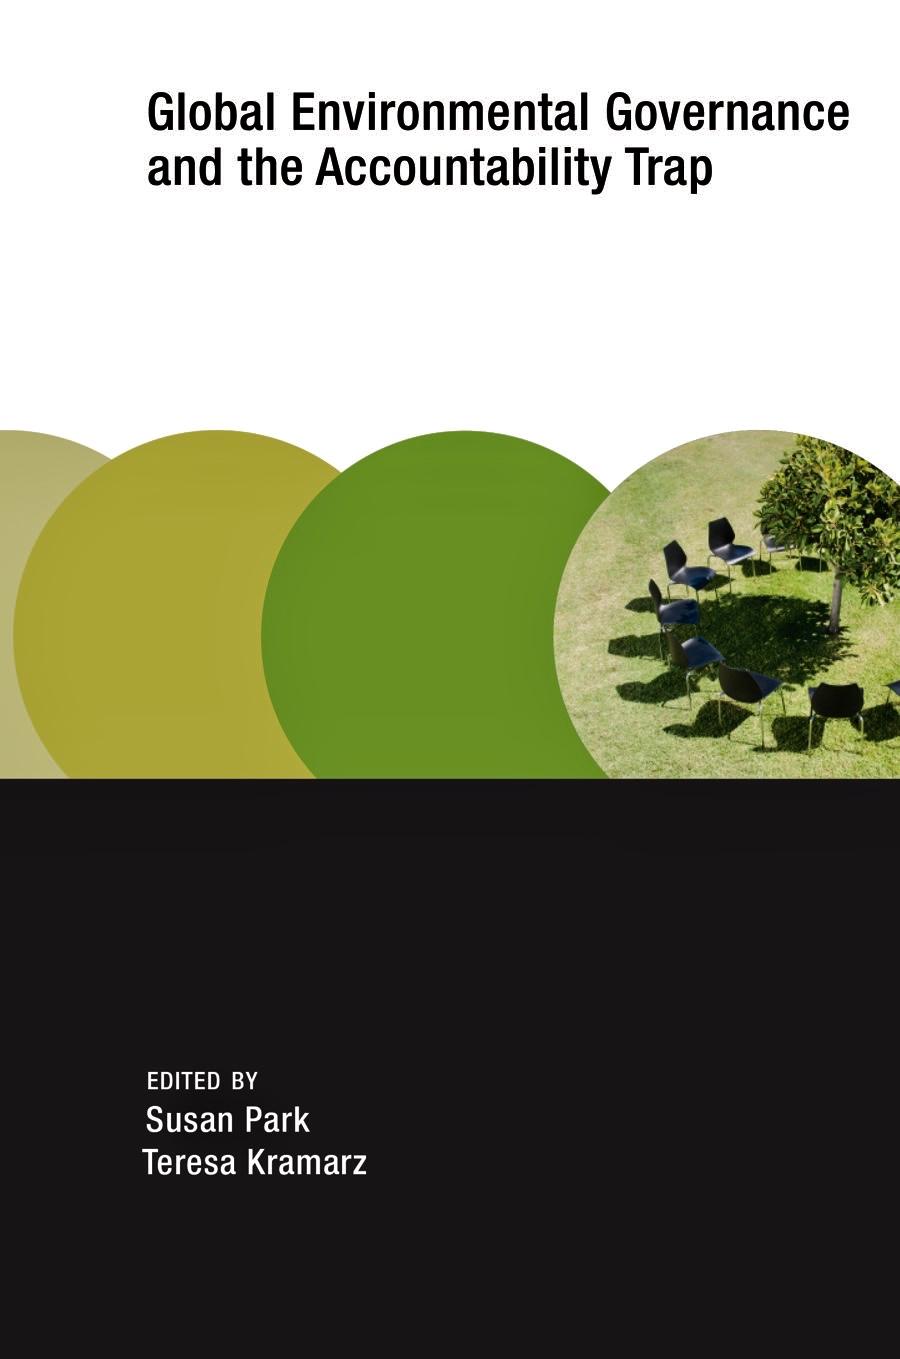 An edited volume by Susan Park and Teresa Kramarz,MIT Press -